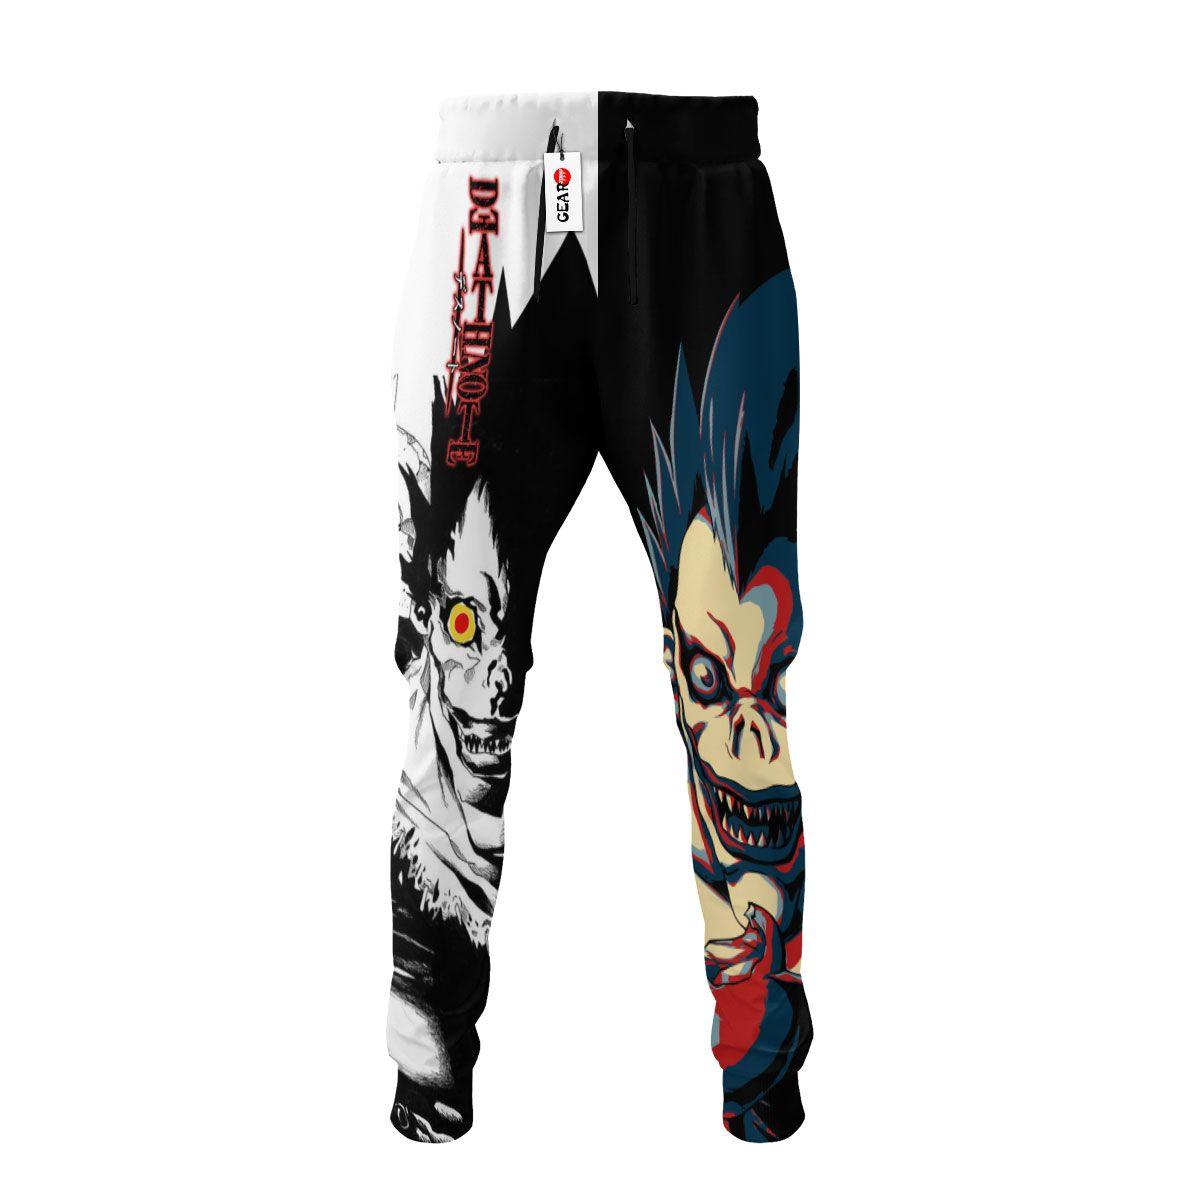 Ryuk Joggers Custom Death Note Anime Sweatpants G01210